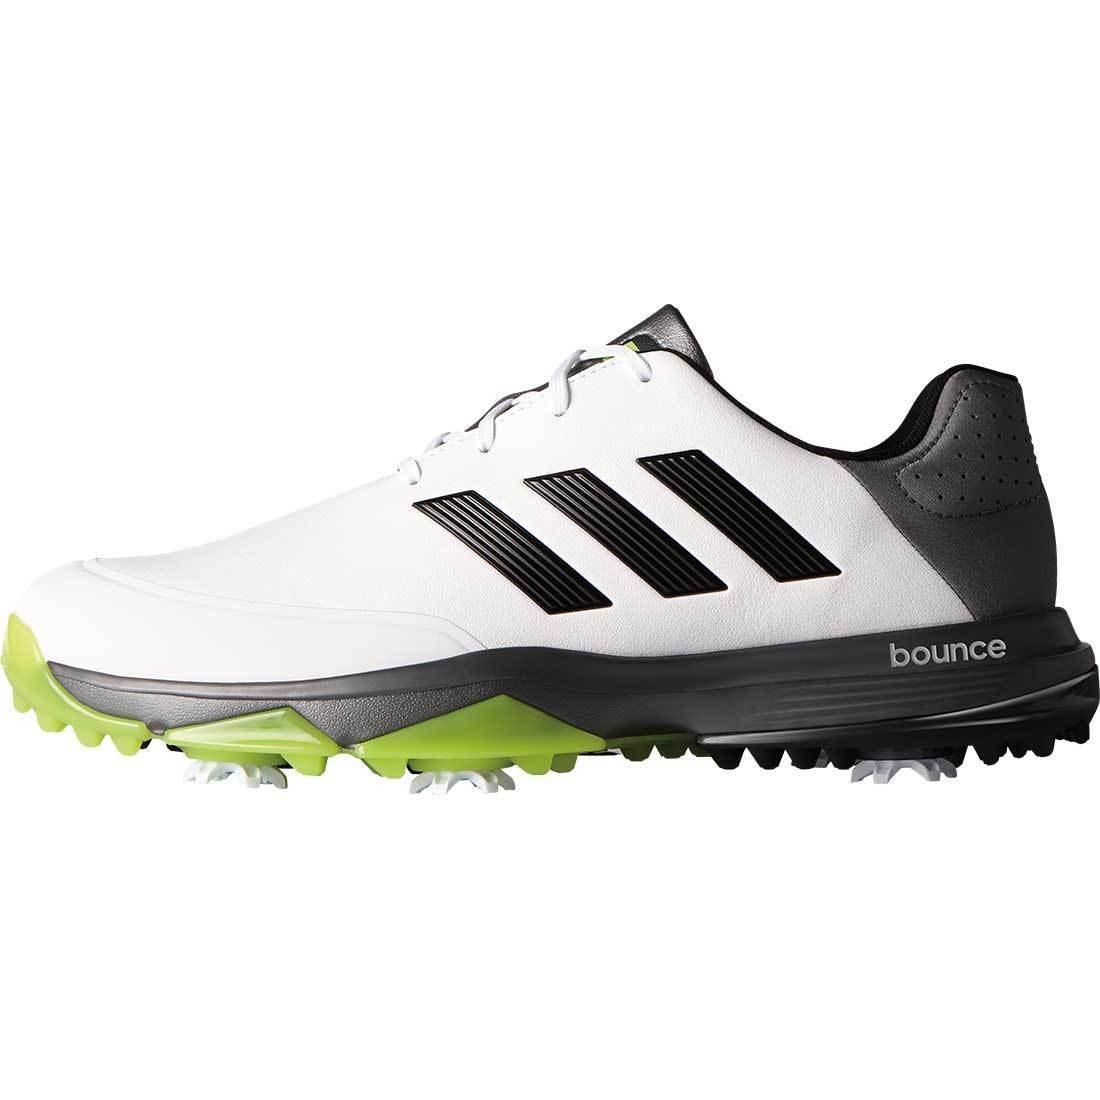 huge selection of fe8e7 21ed3 Adidas Mens Adipower Bounce WhiteBlackSolar Slime Golf Shoes  Q44787-Q44790